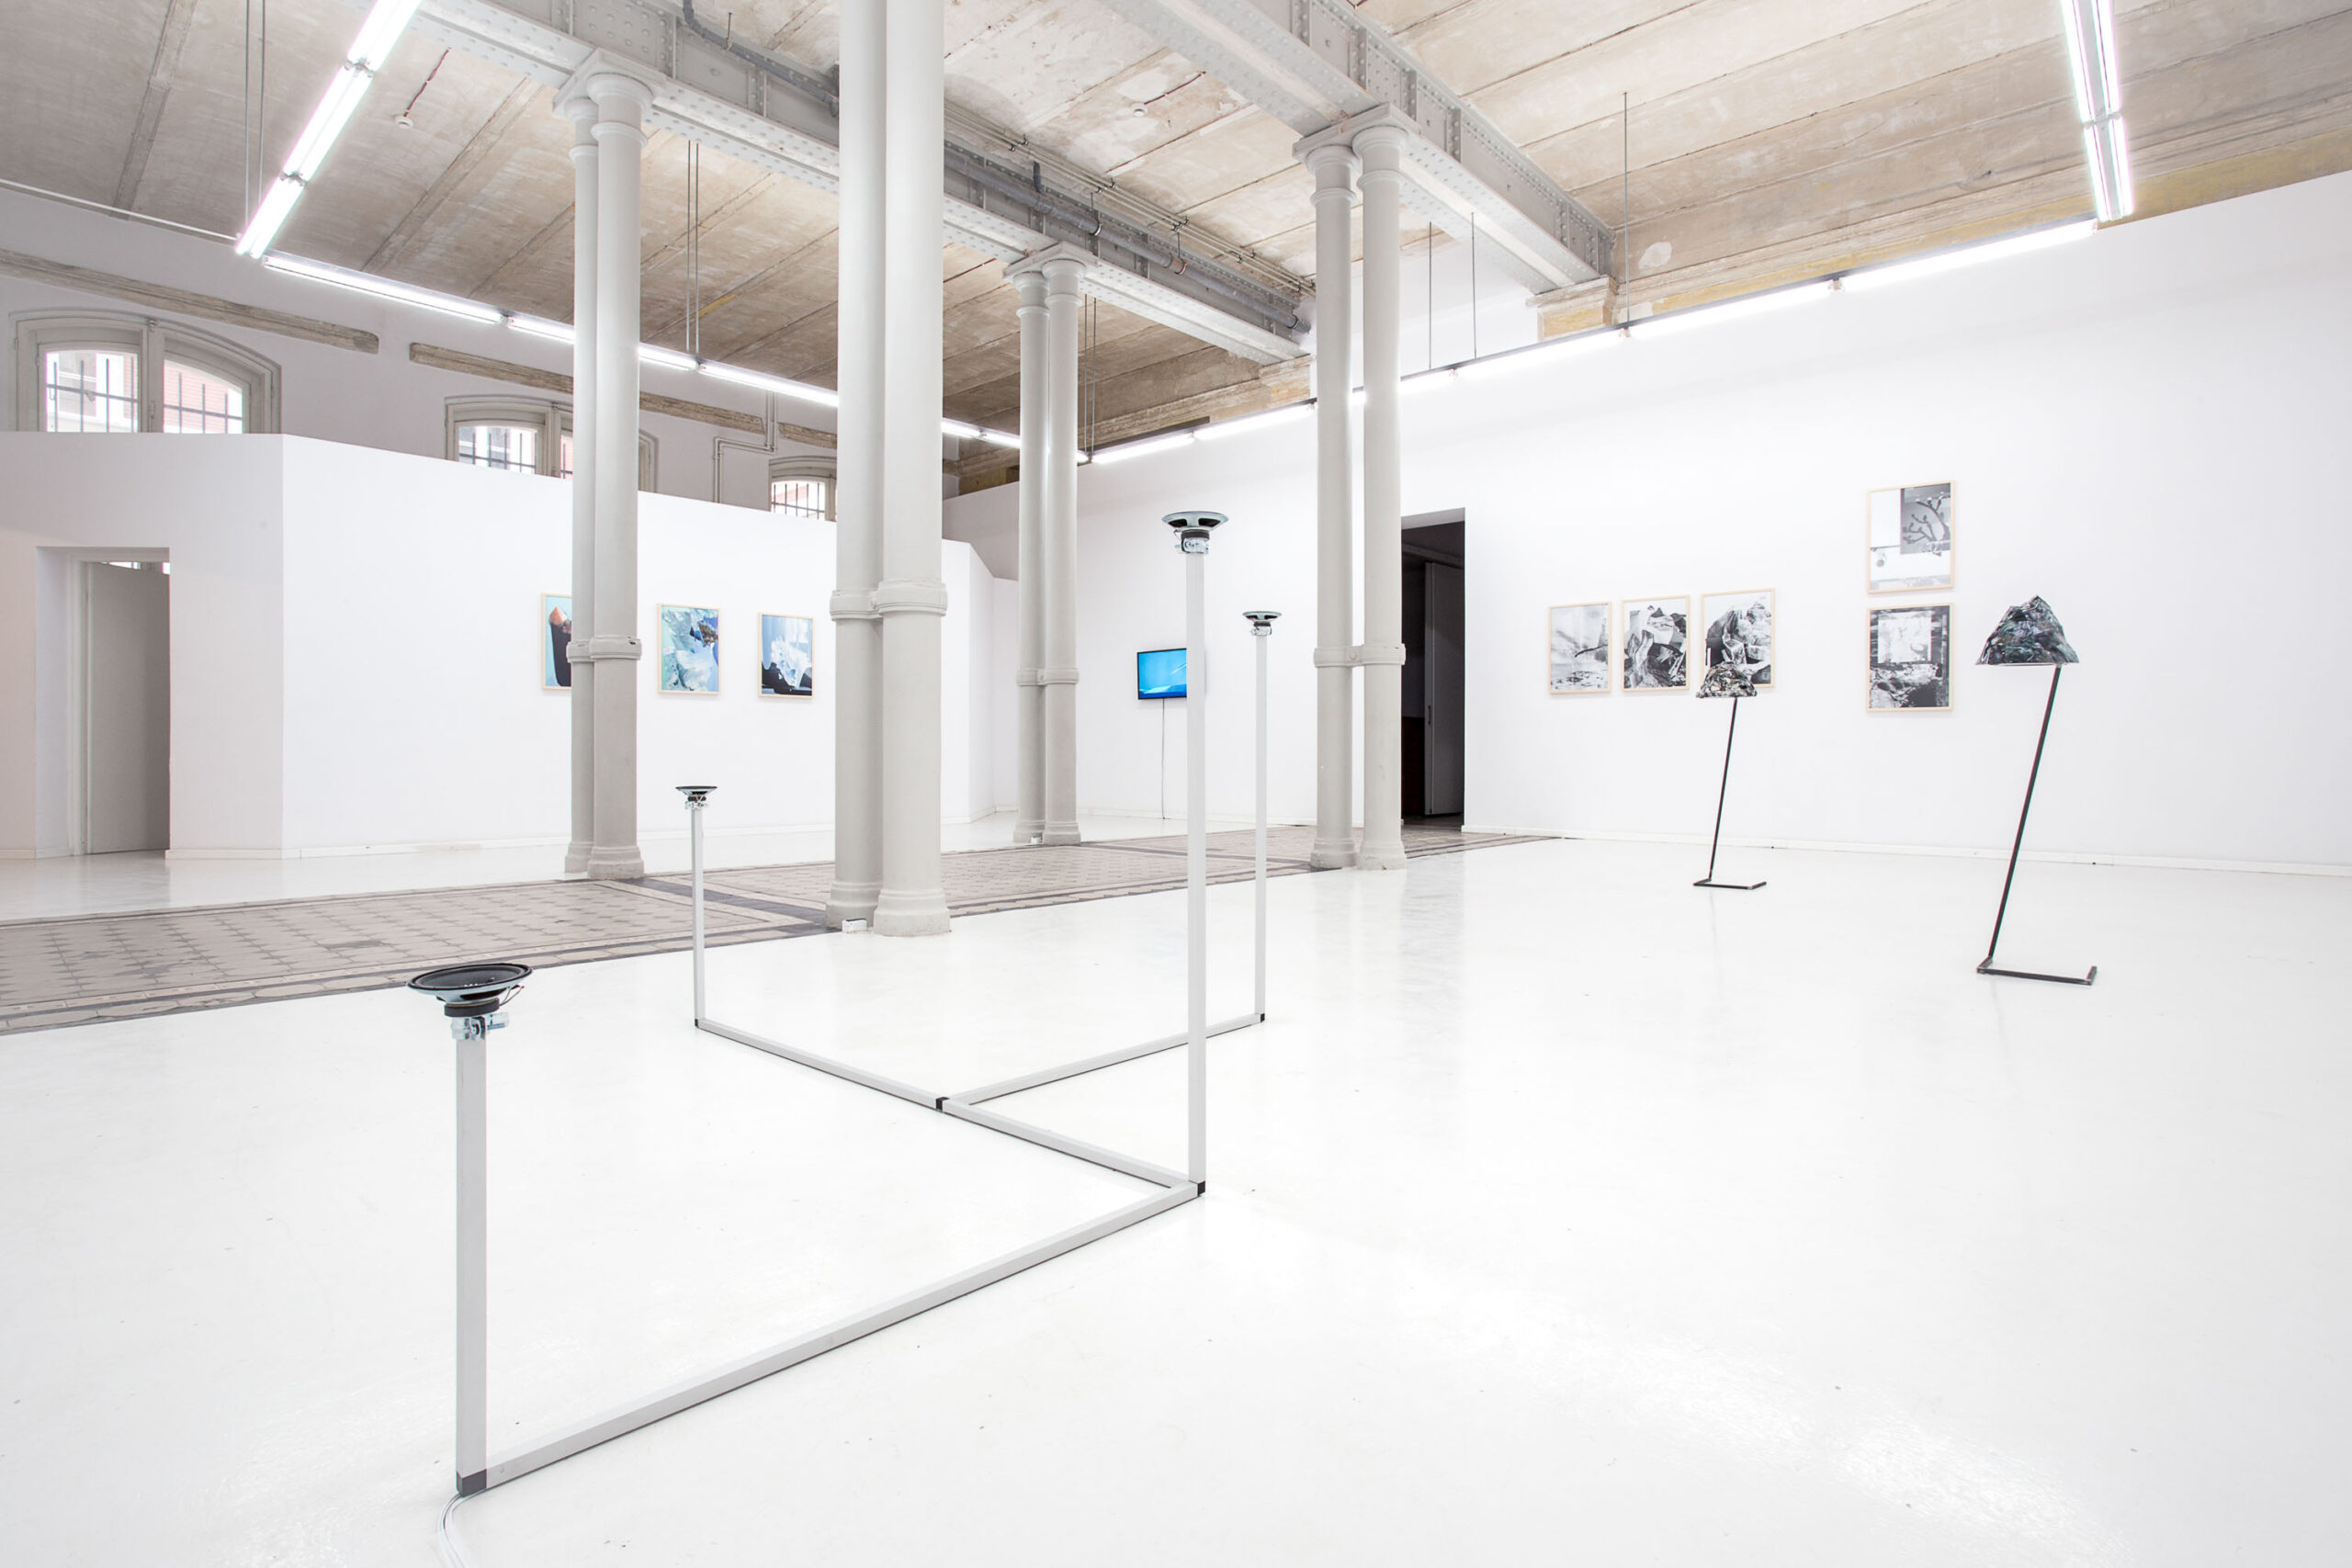 Jacek Doroszenko - How to travel - Sound installation - Warsaw - Propaganda - Exhibition 01